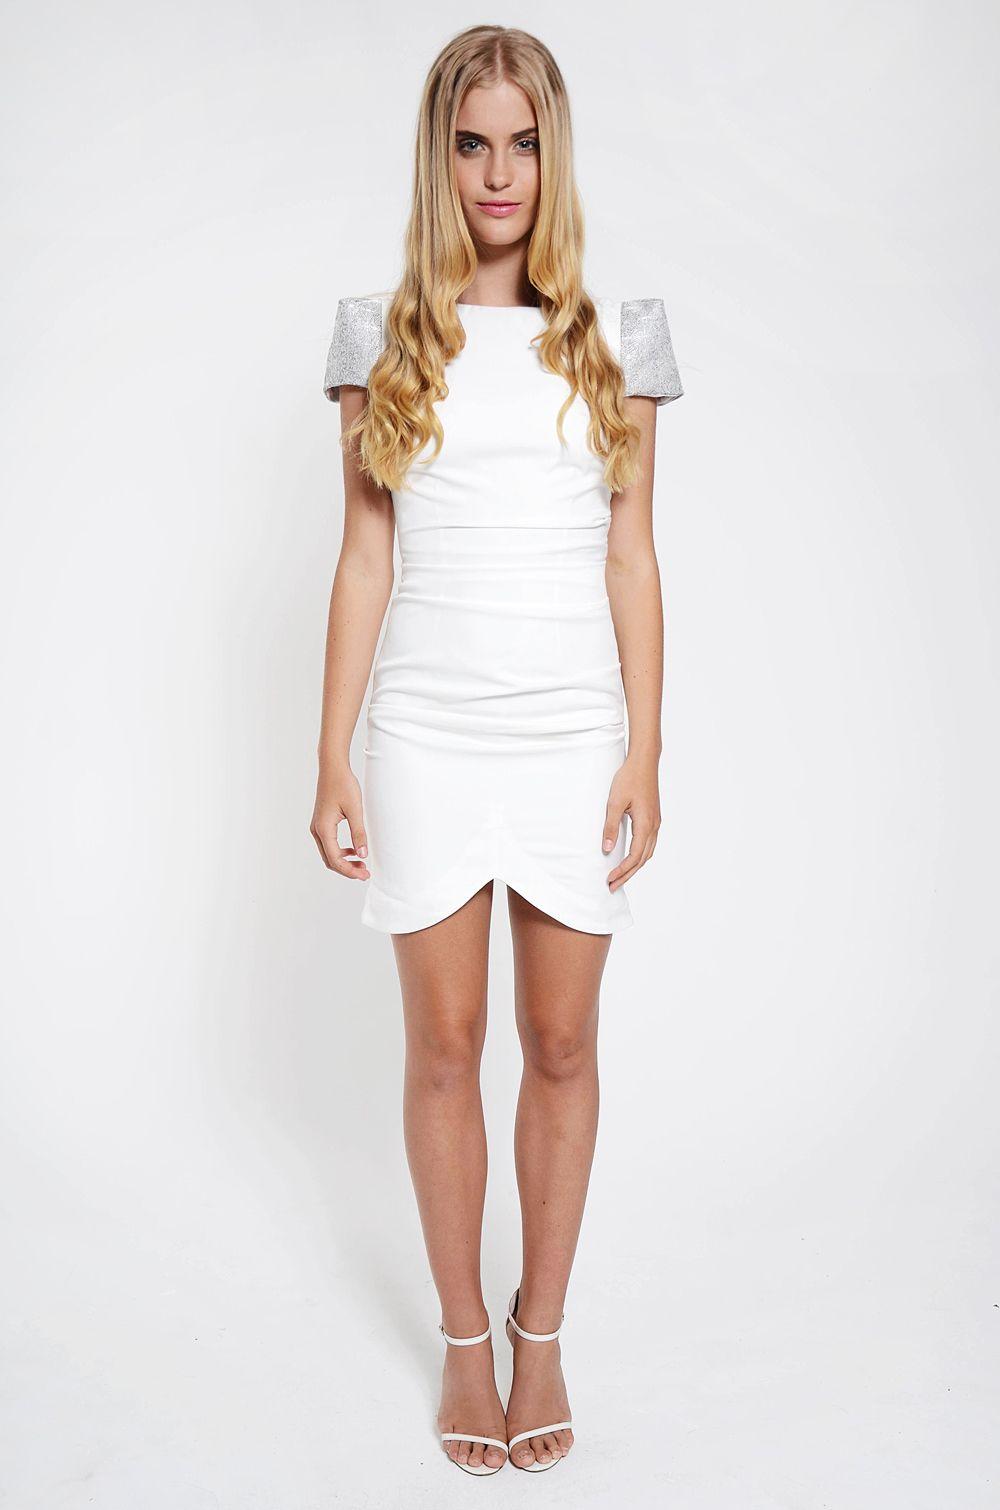 Dresses : Decadent Cap Sleeve Dress - White/ Metallic Silver